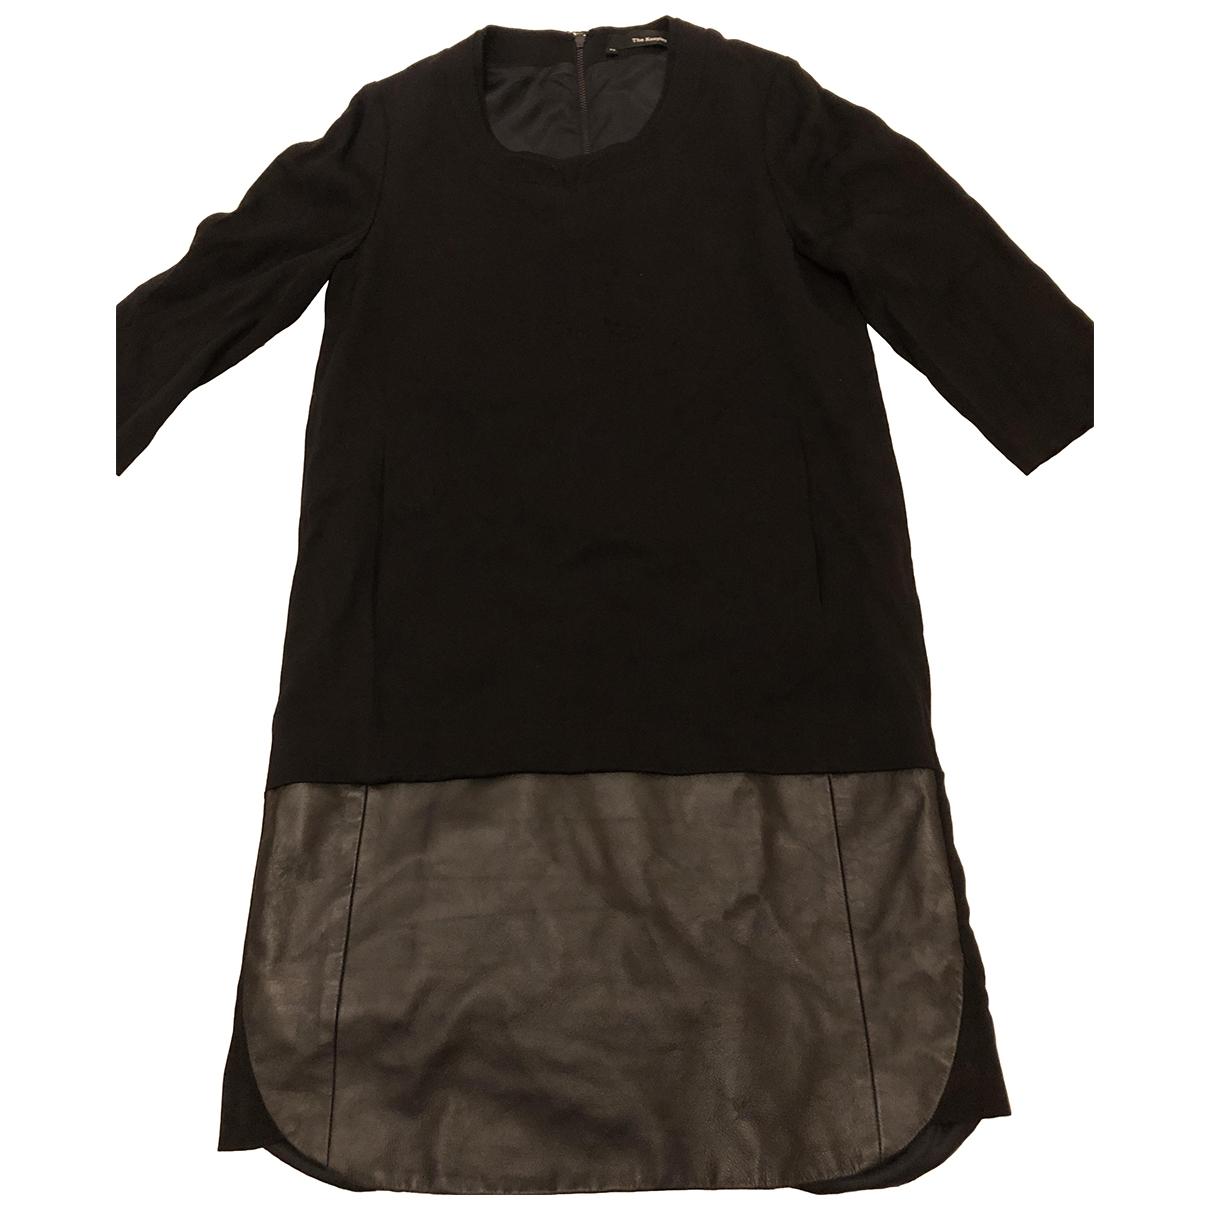 Vestido midi The Kooples